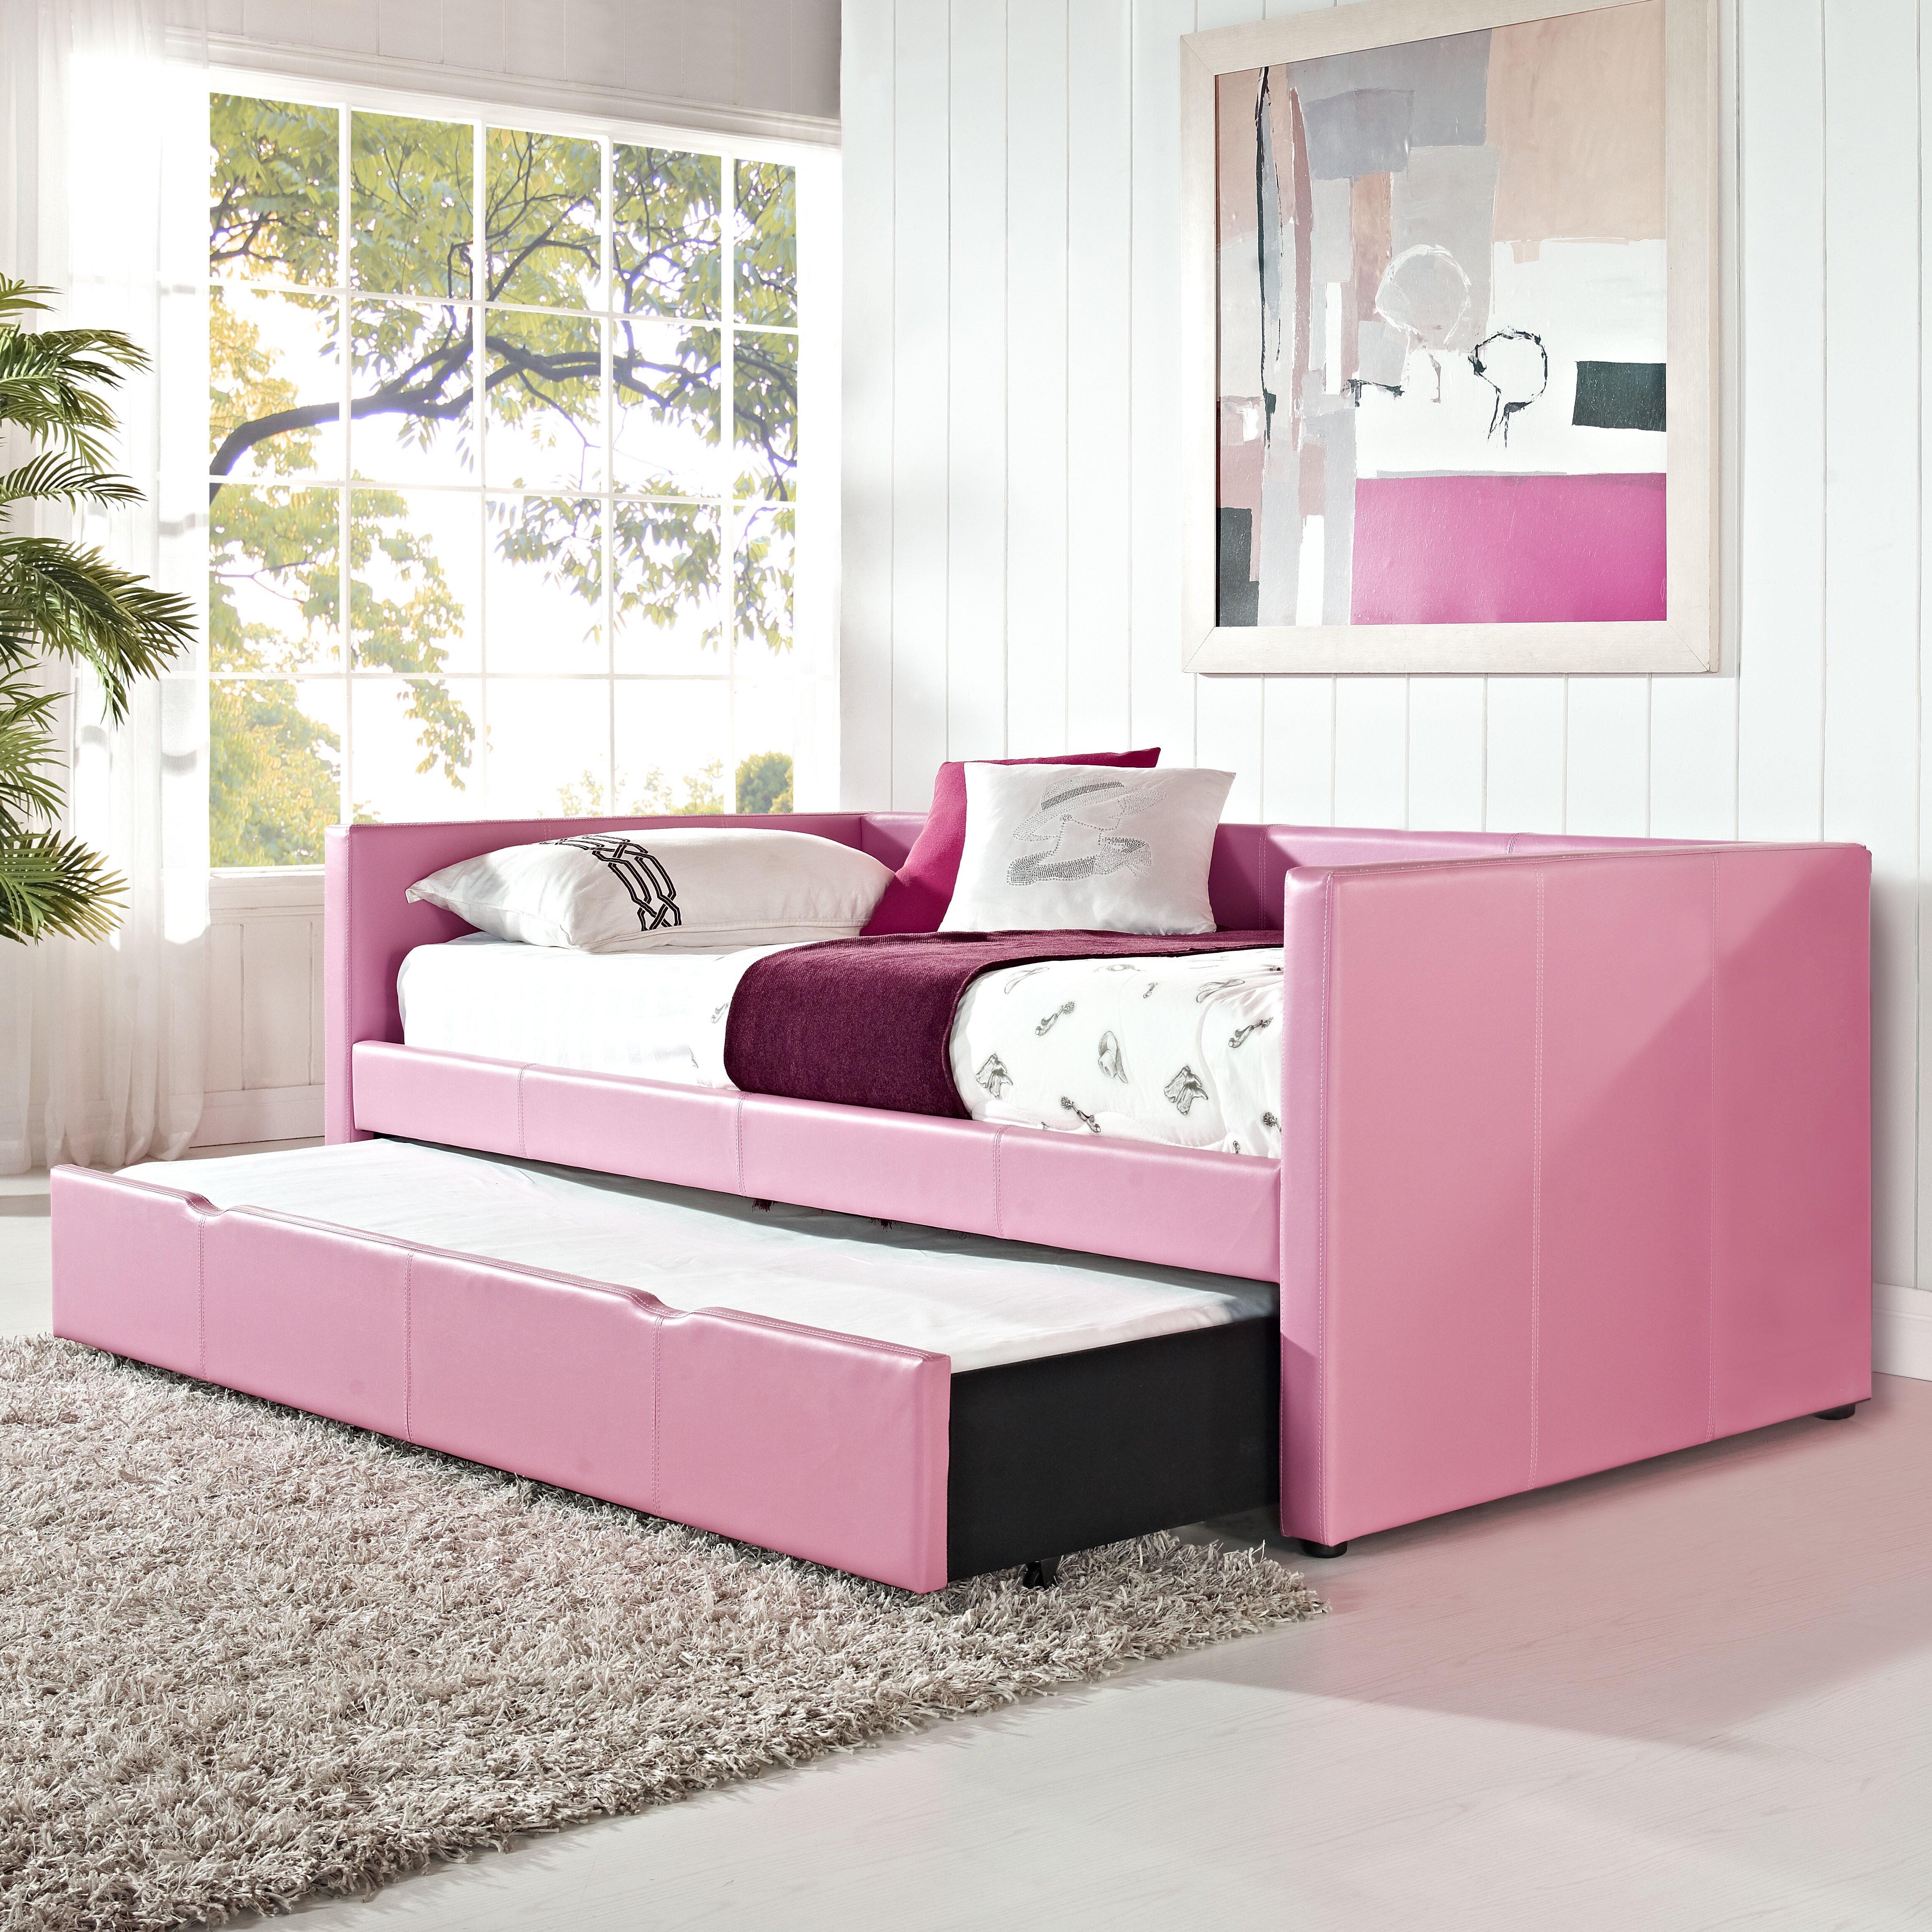 Kelley S Furniture